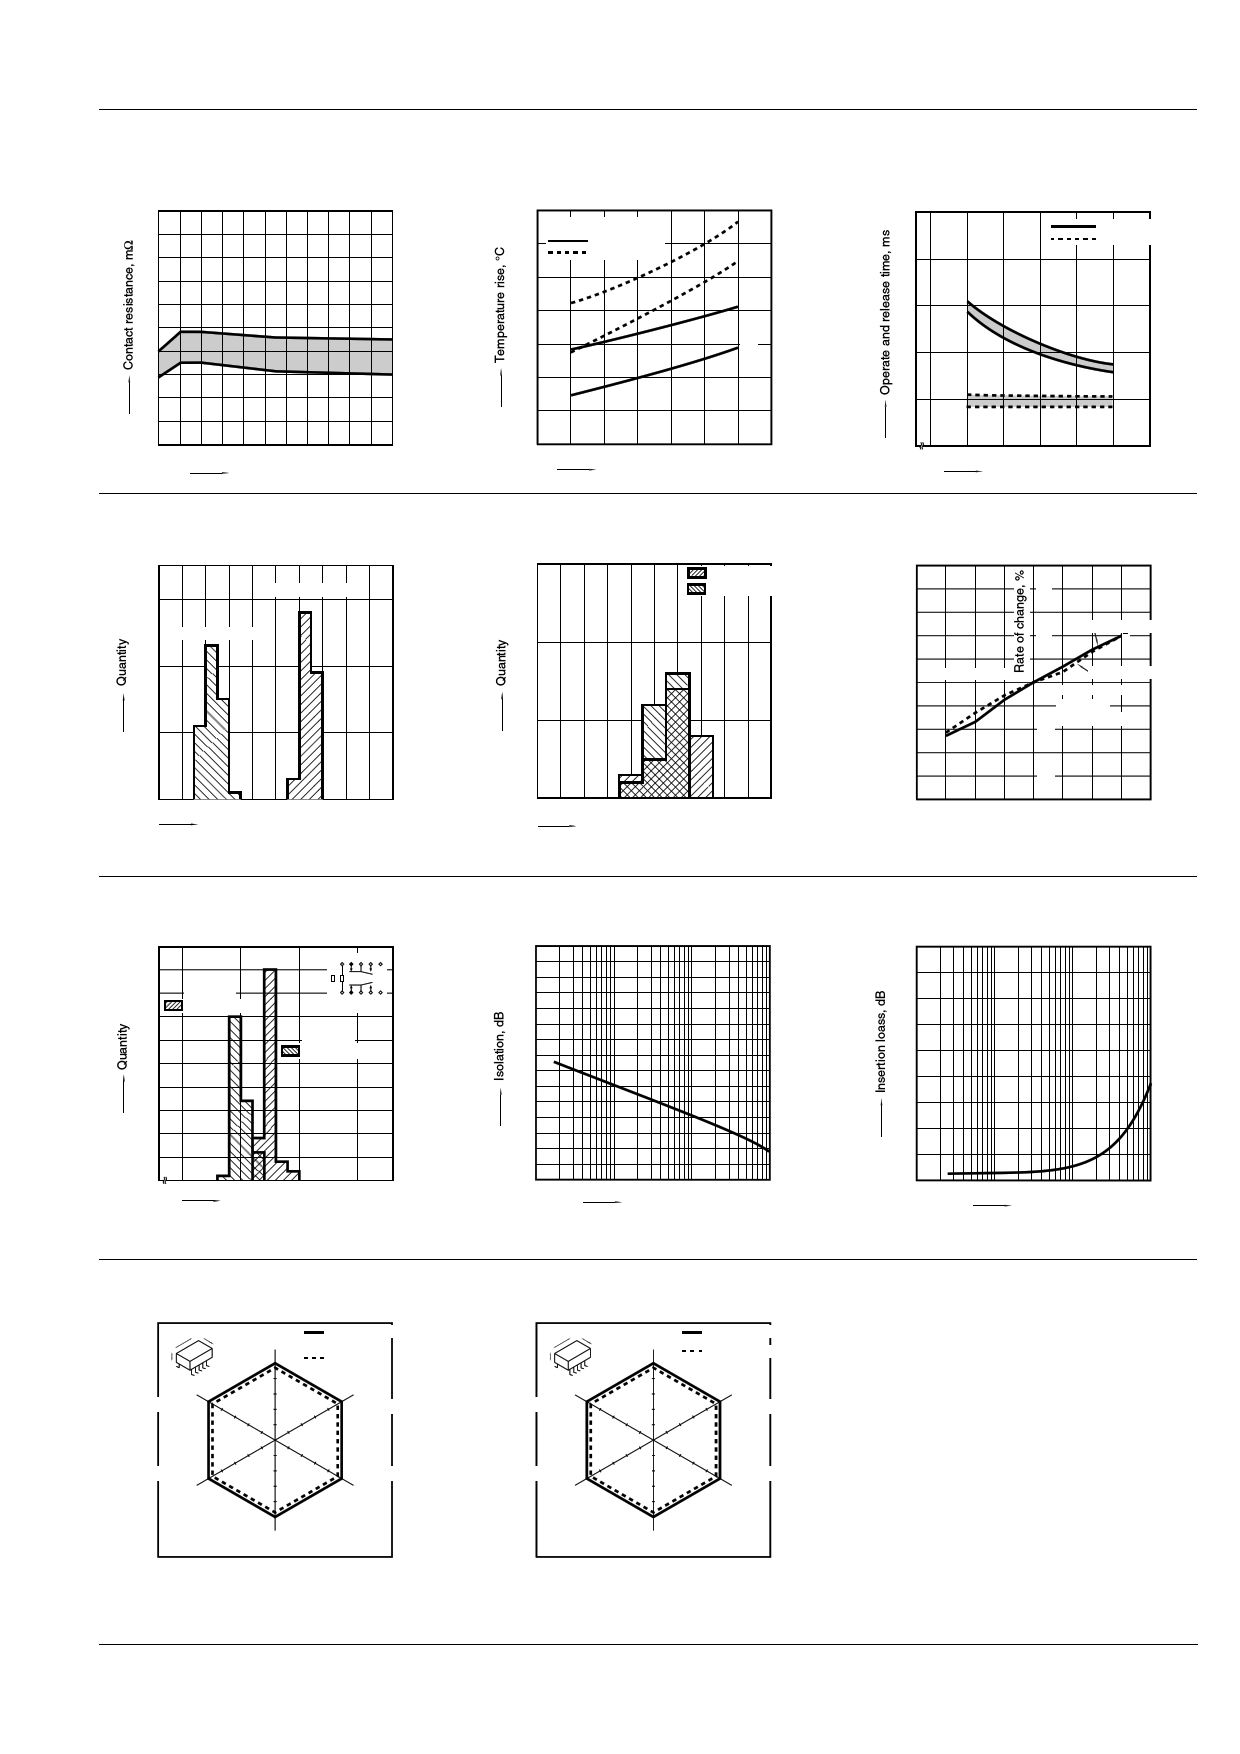 TQ2SL-L2-9V pdf, 반도체, 판매, 대치품